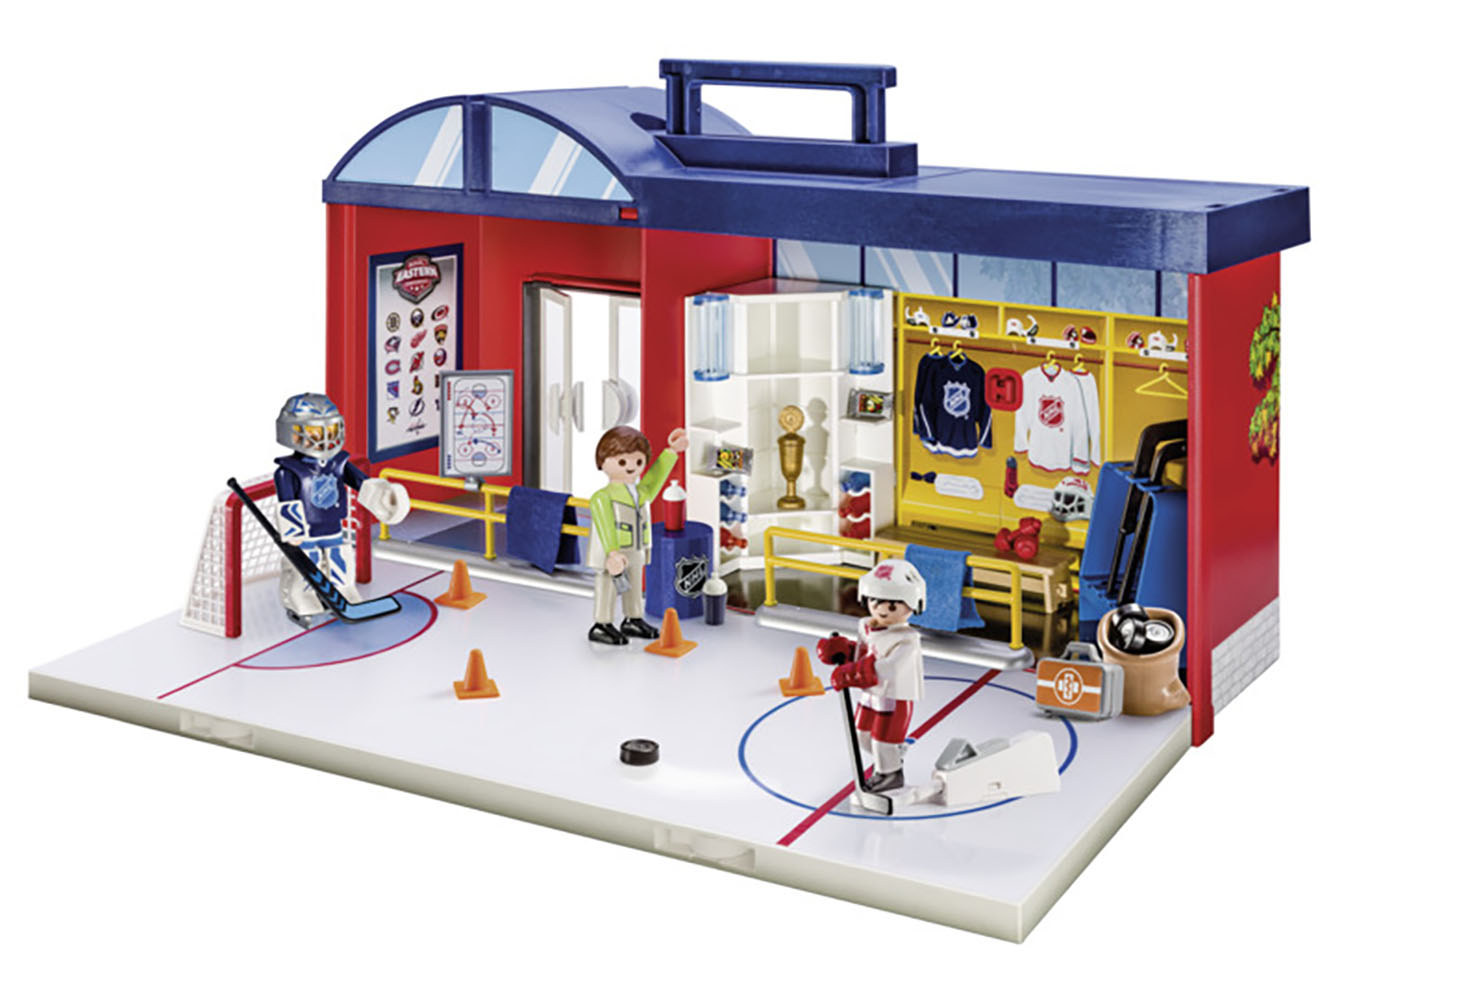 LNH - Aréna de hockey transportable